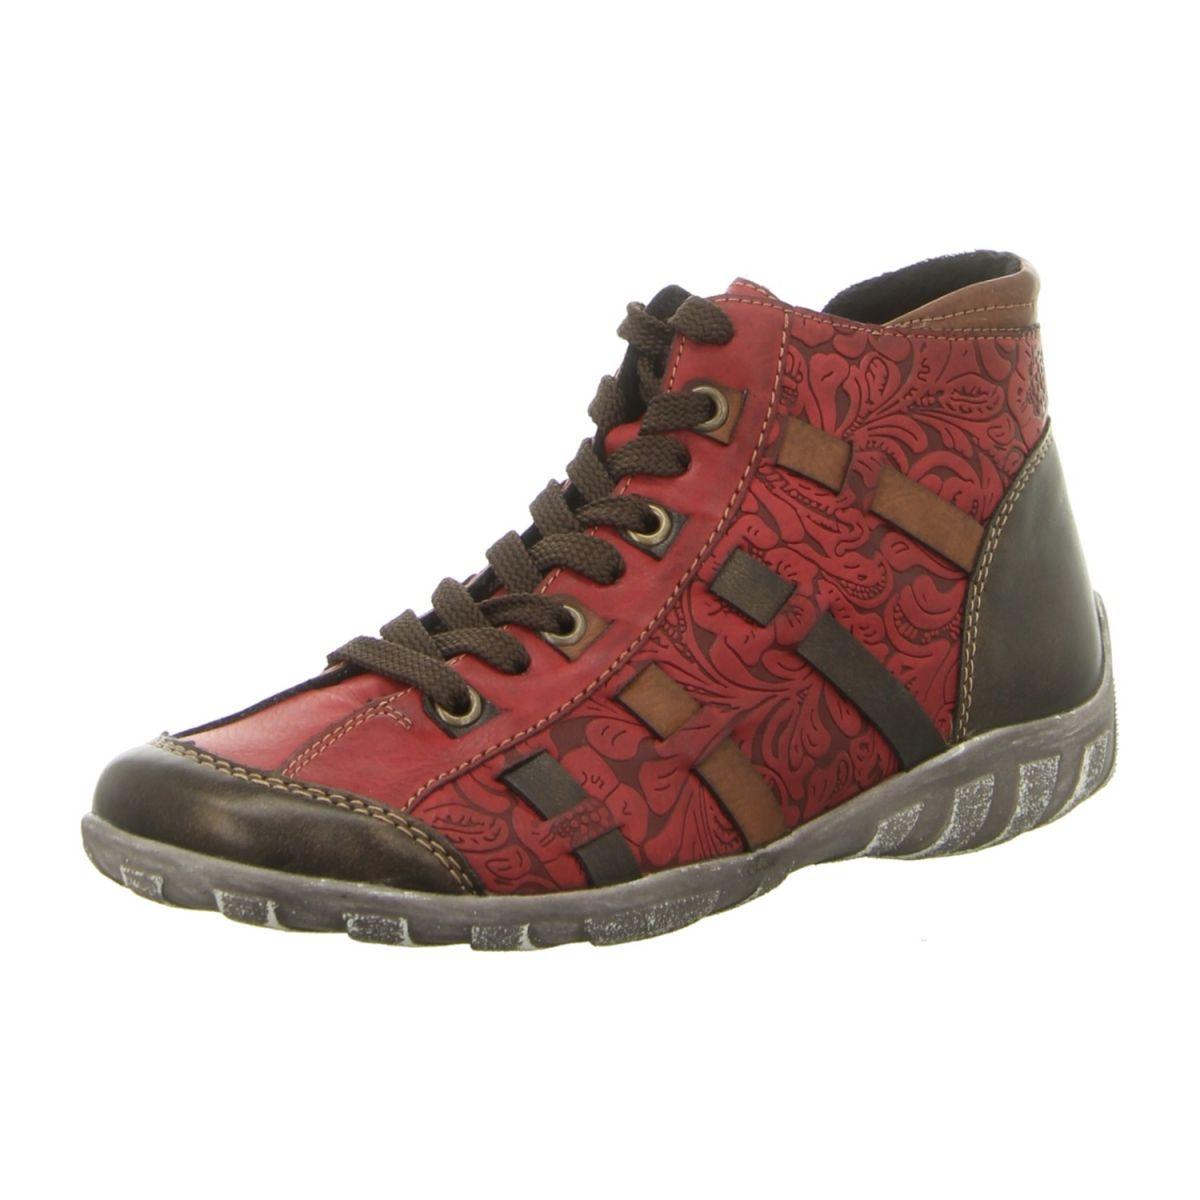 Remonte Schuhe Stiefelette R3486 35 rot kombi rot NEU